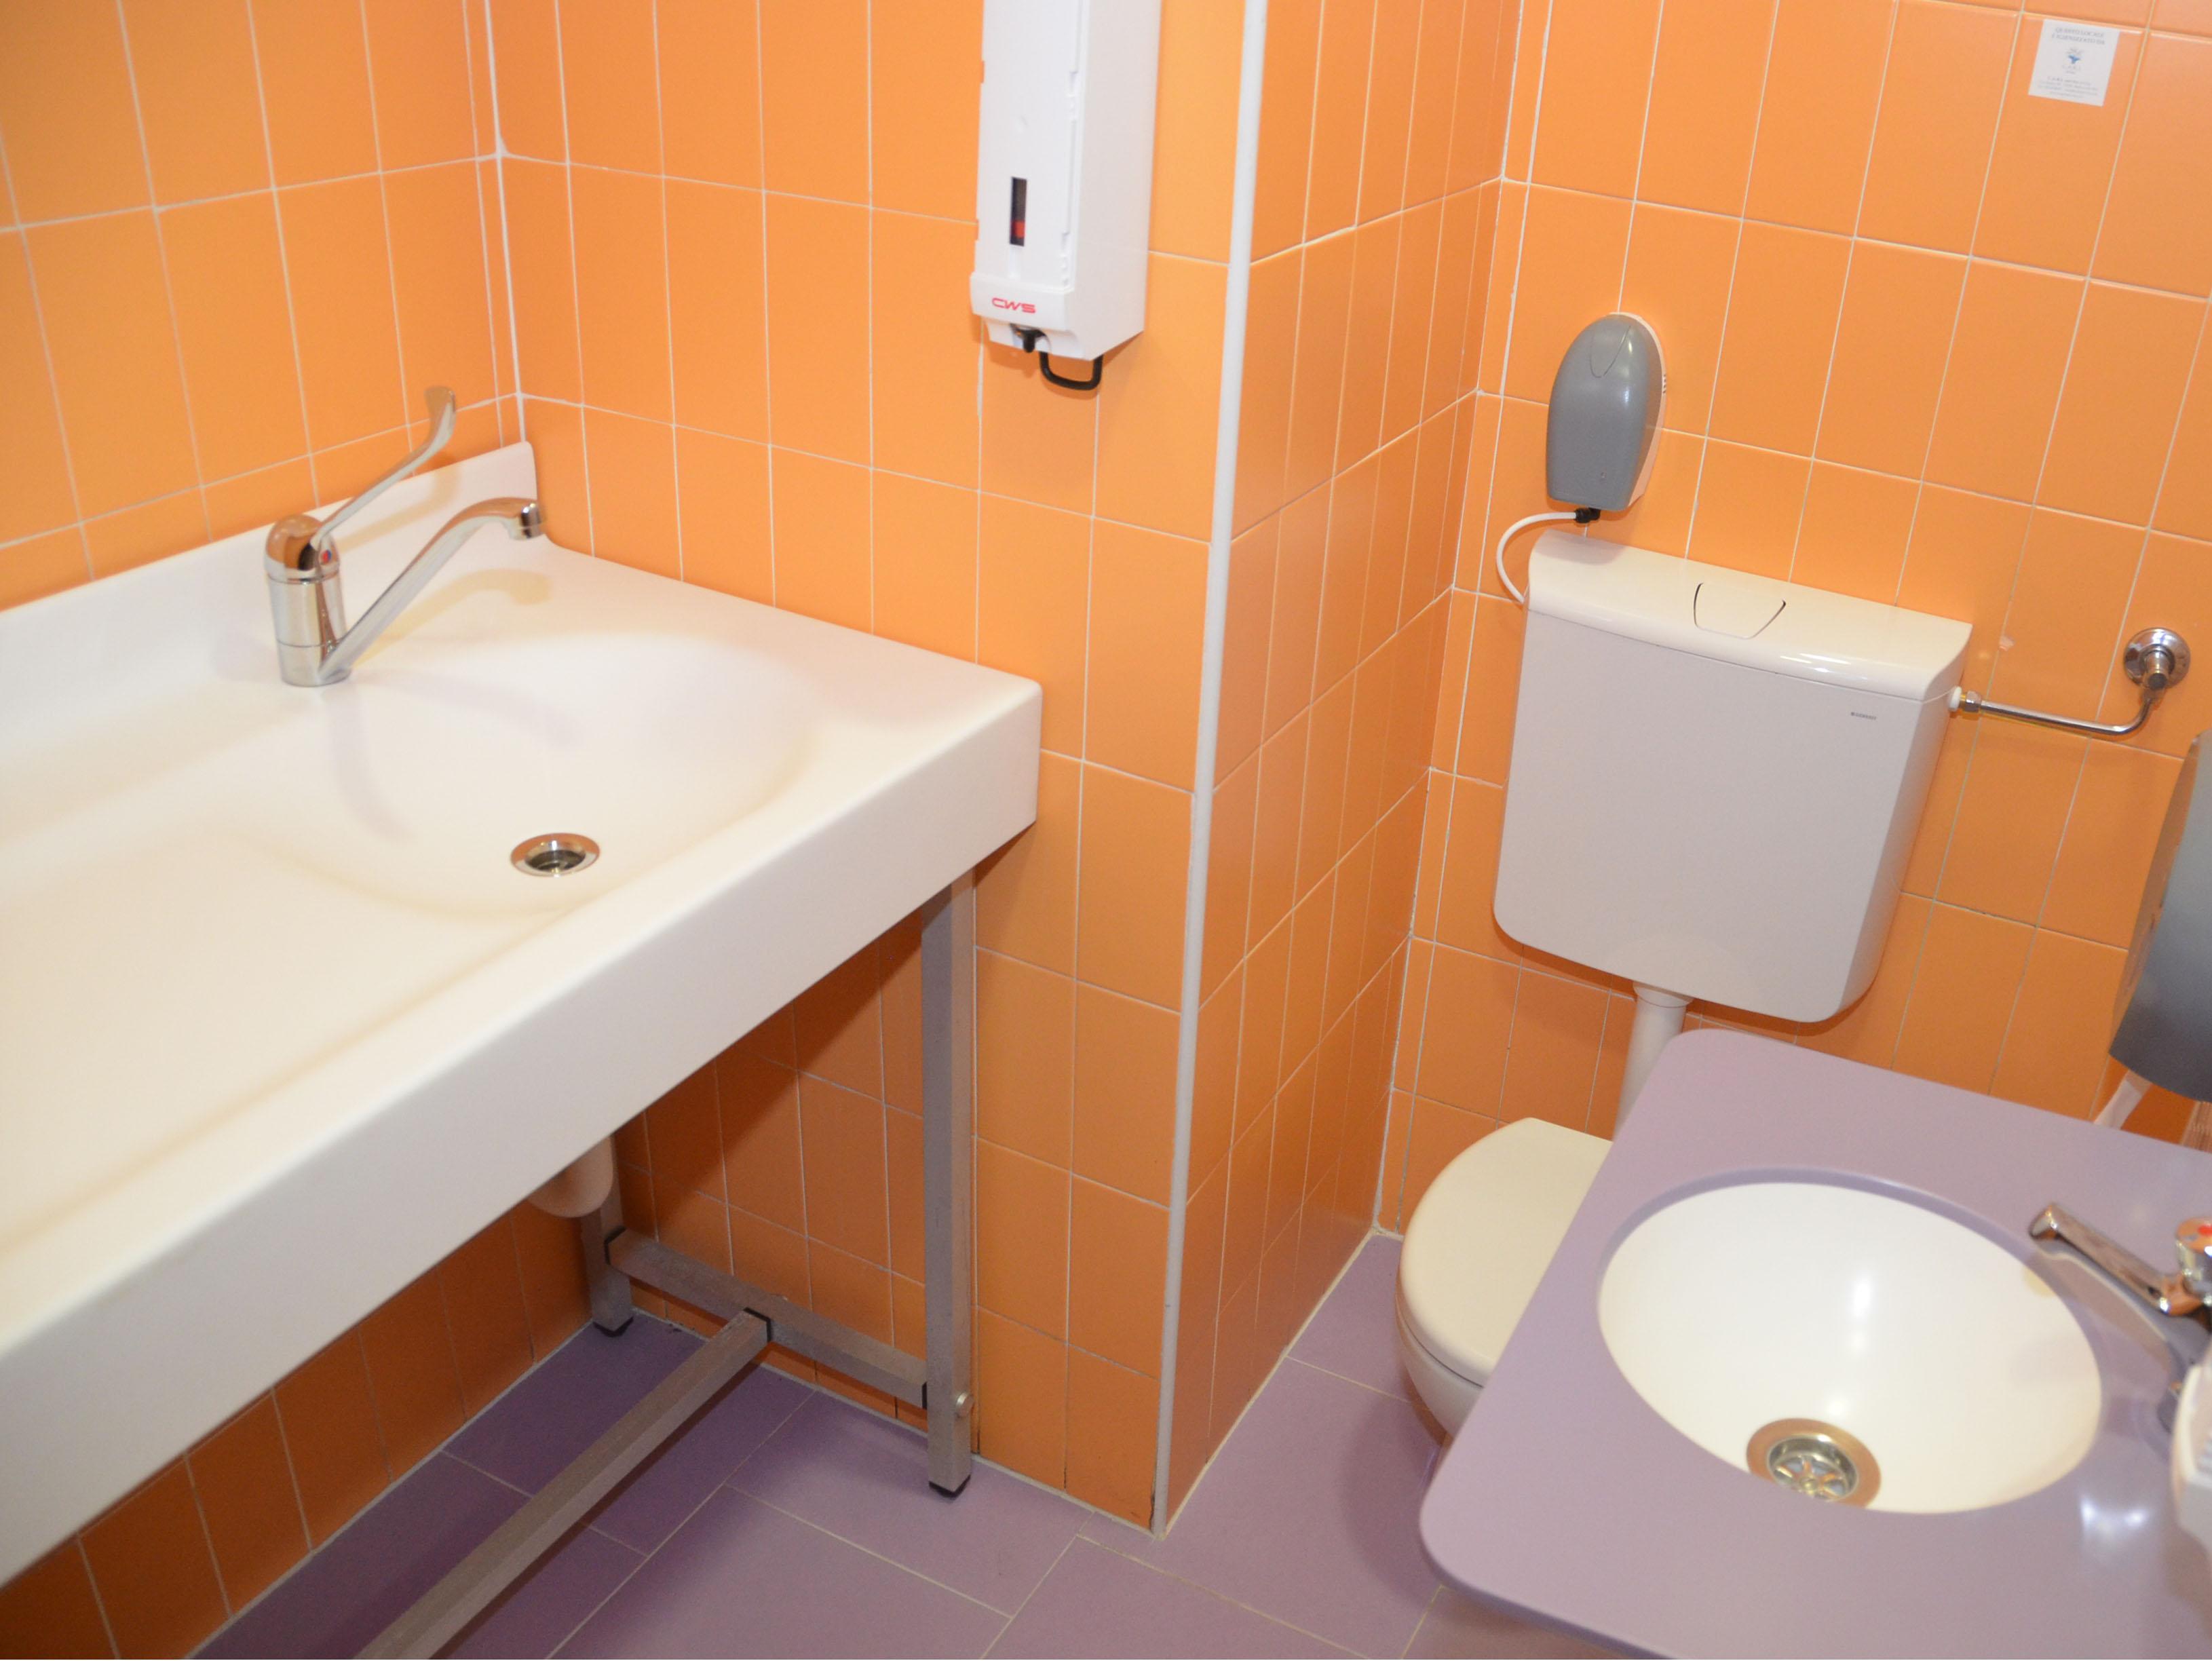 Baby-toilet-Centro- commerciale-il-gotico-piacenzajpg